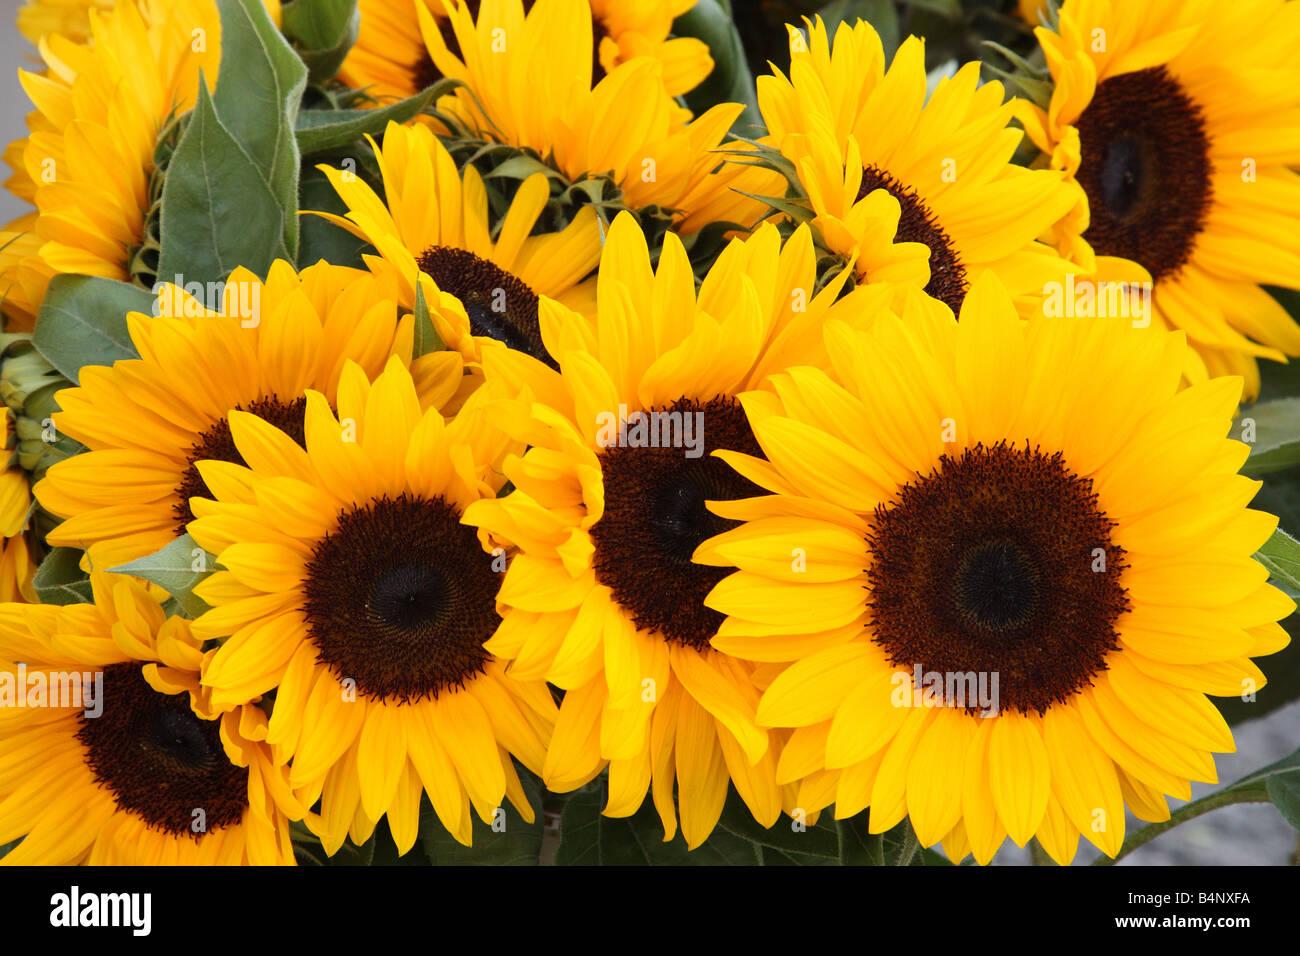 Bunch of sunflowers.Helianthus annuus - Stock Image